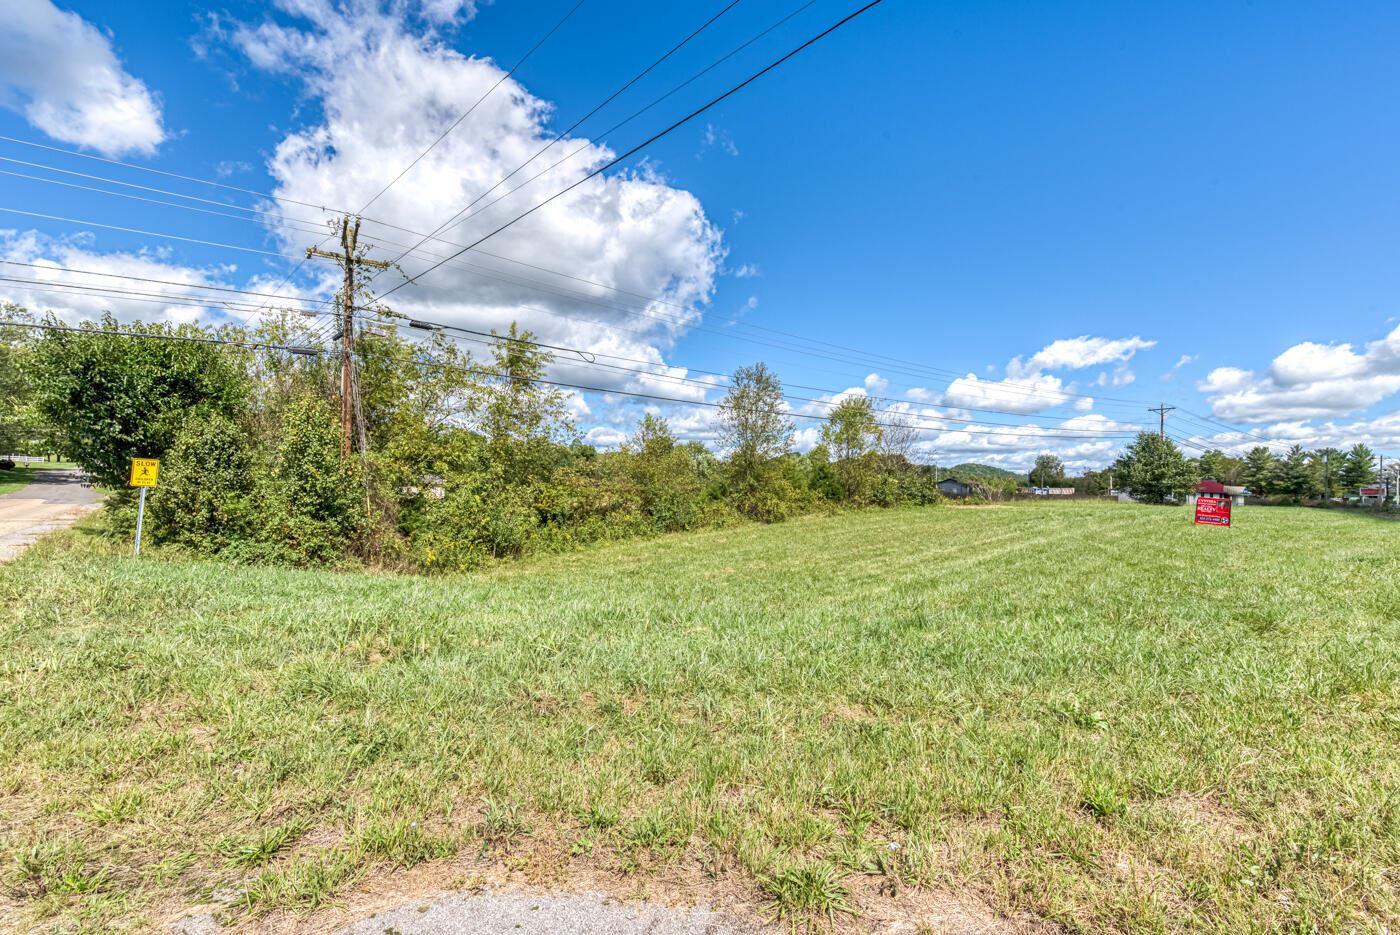 Photo of Tbd2 Highway 11, Rogersville, TN 37857 (MLS # 9929296)